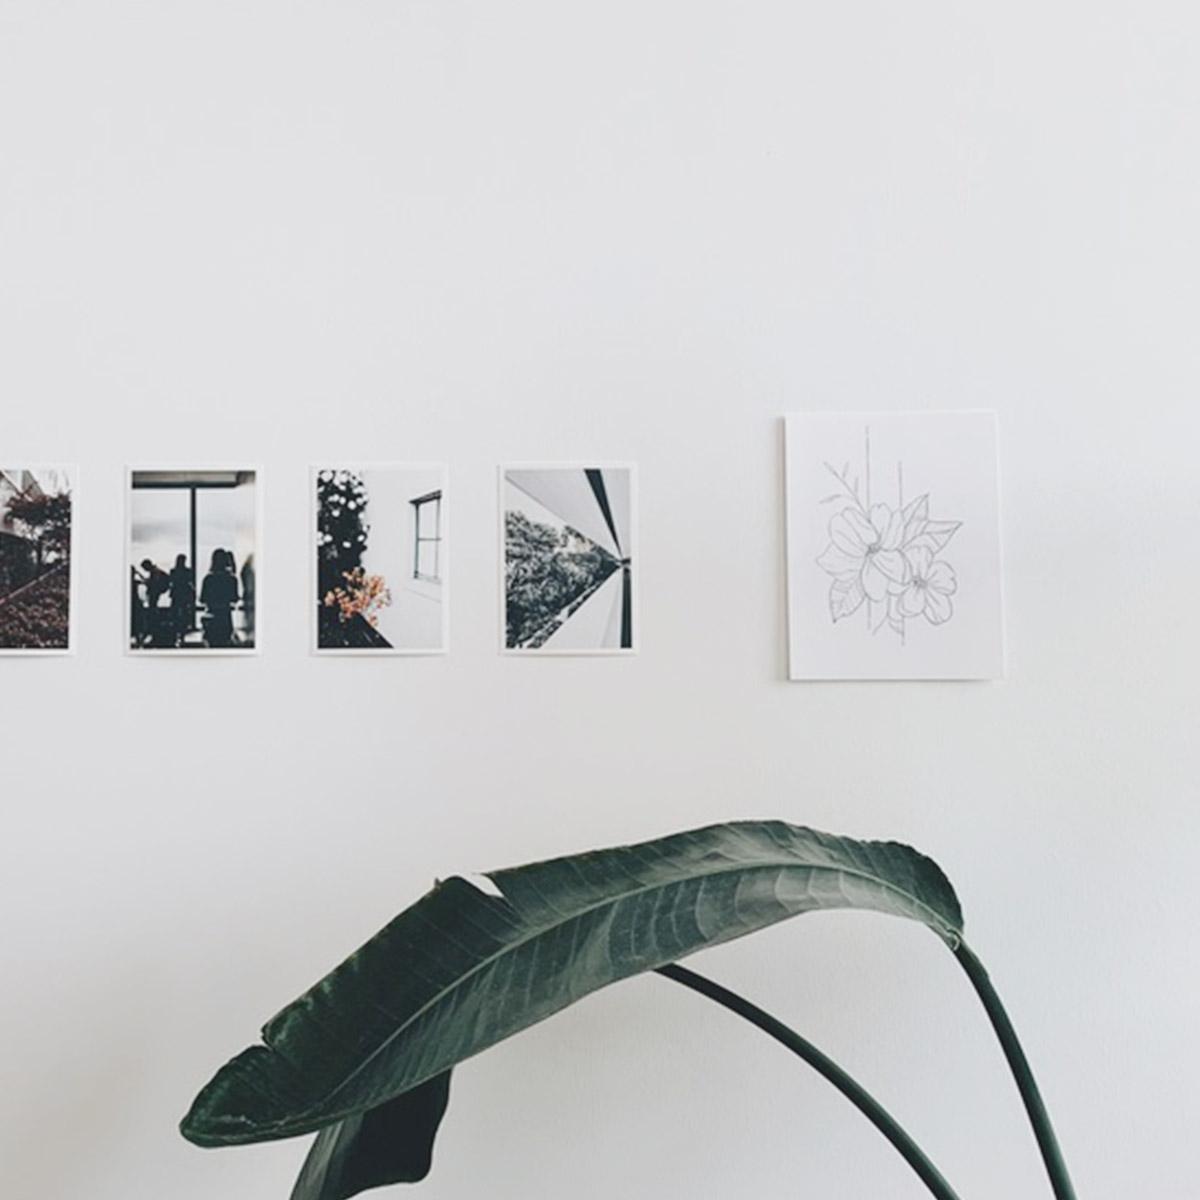 Artifact Uprising Everyday Photo Prints on wall above banana tree